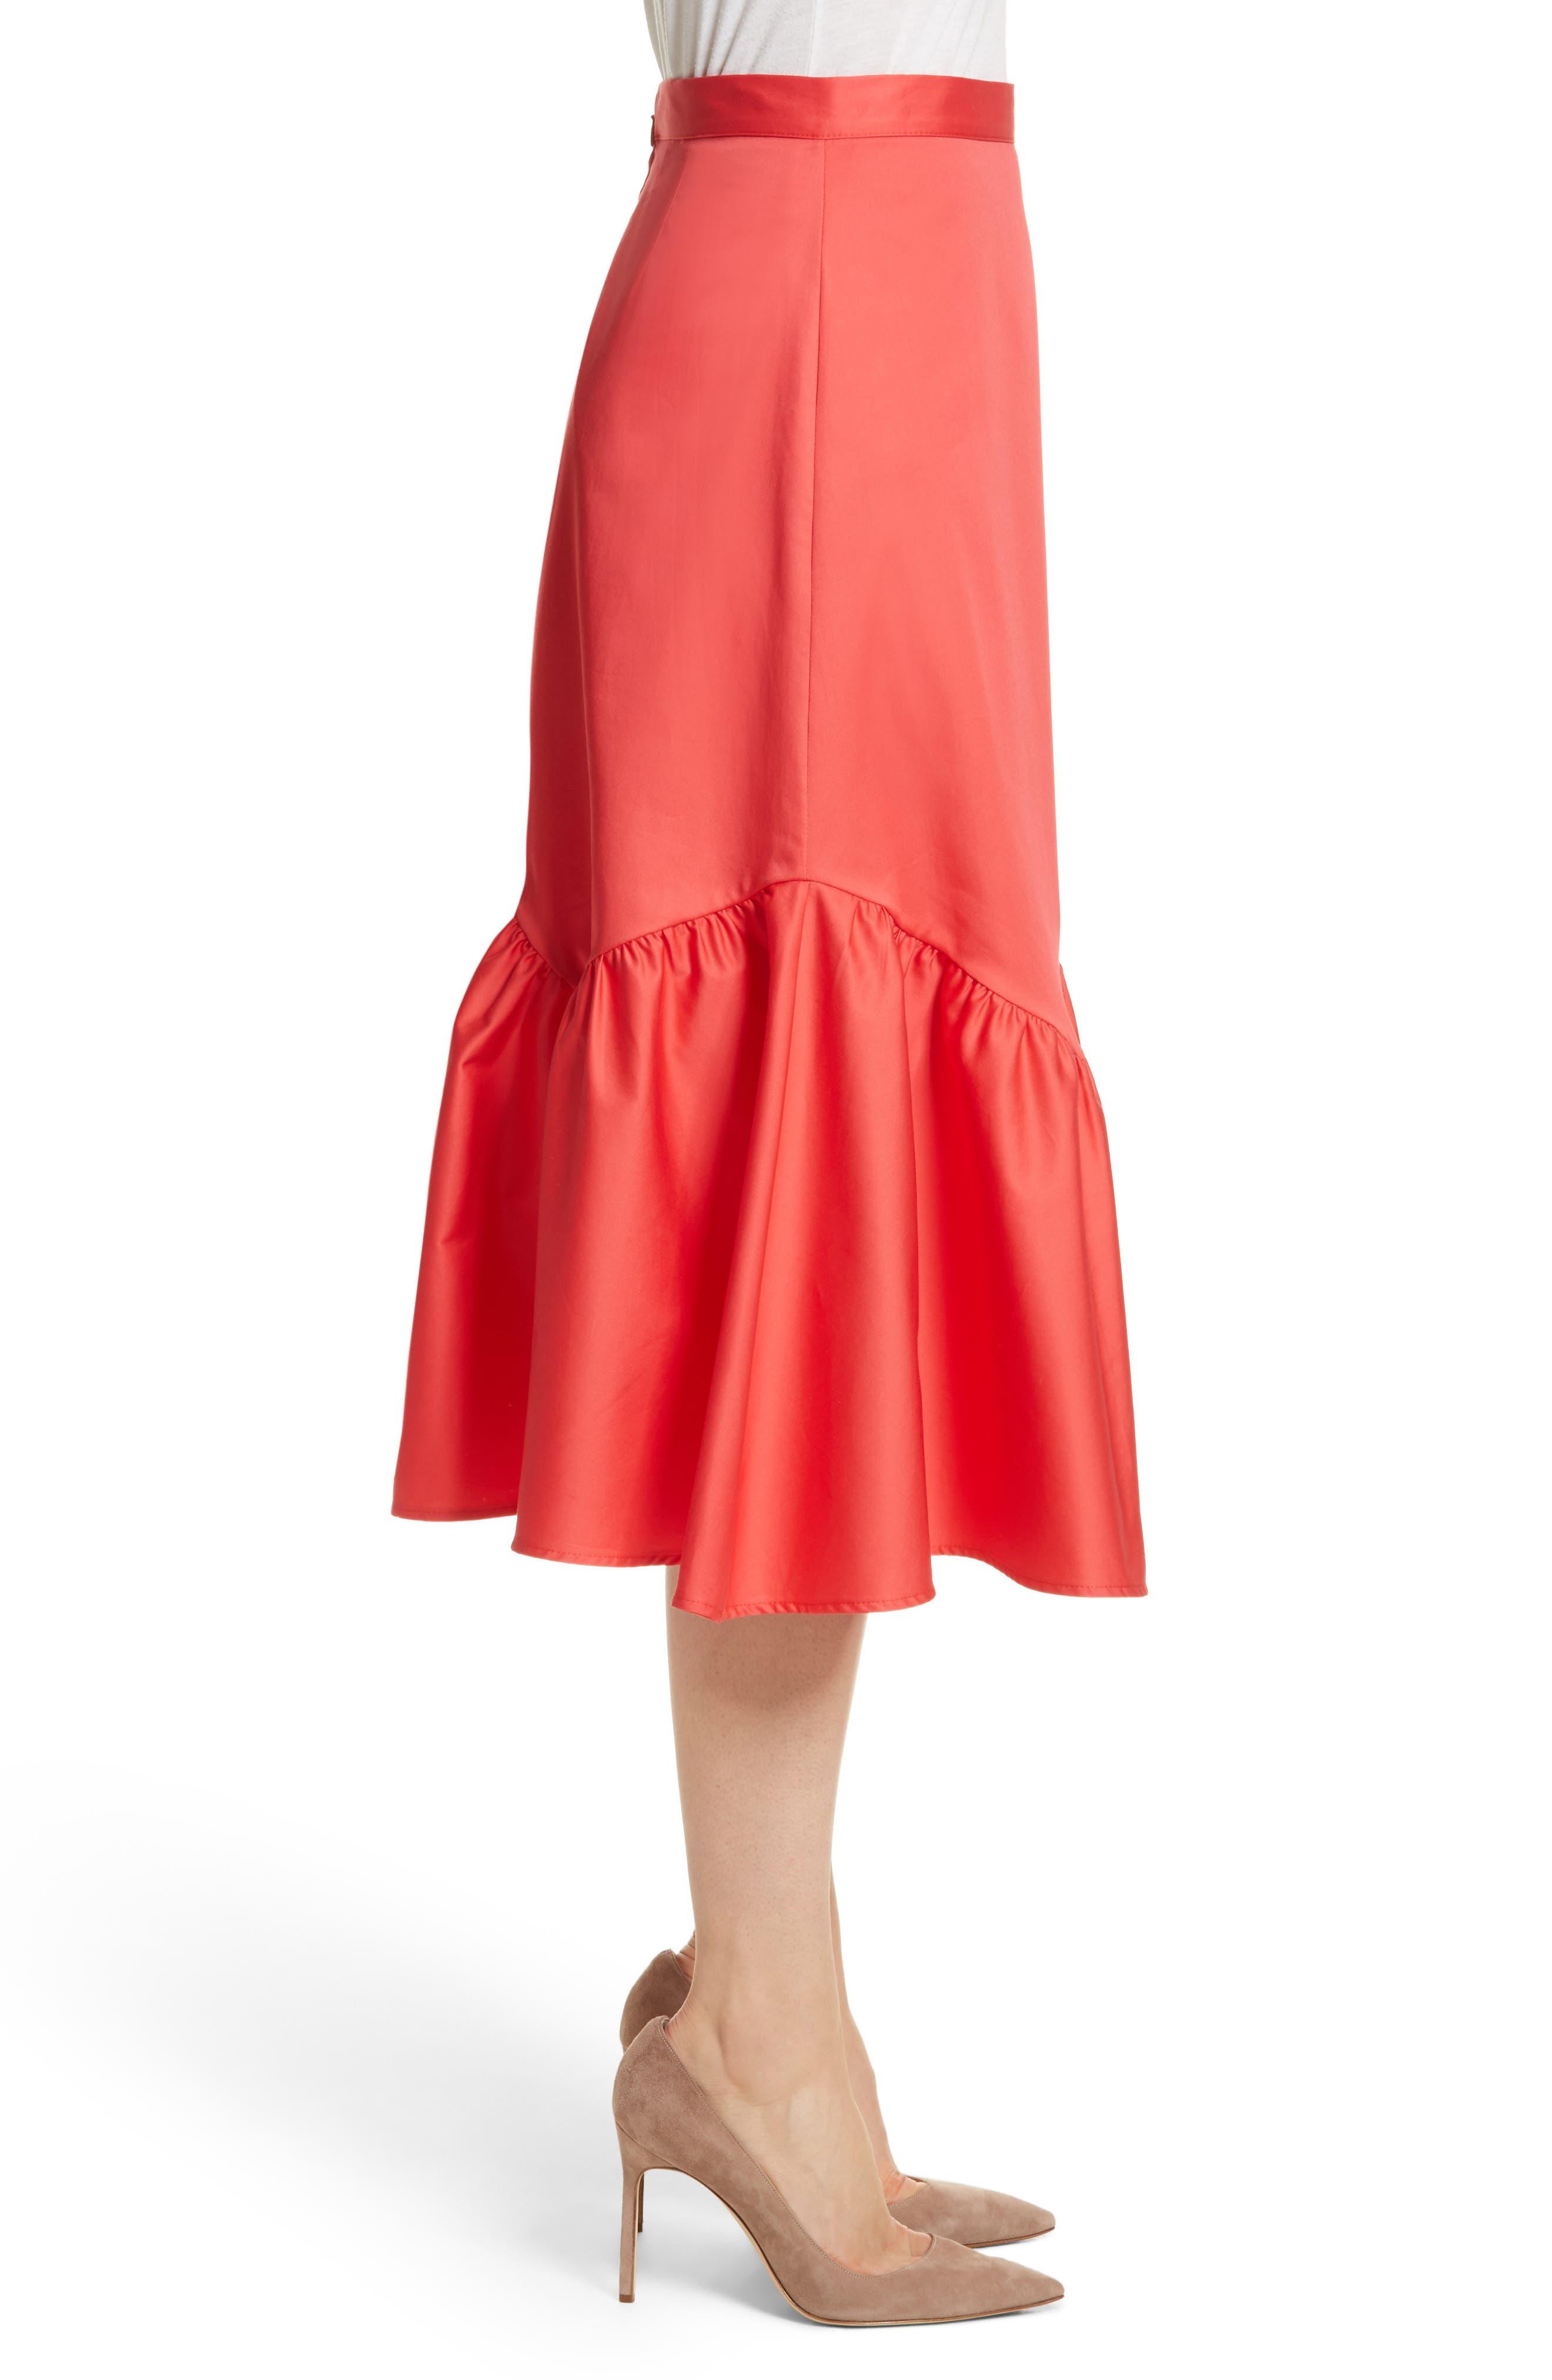 Prose & Poetry Tyra Midi Skirt,                             Alternate thumbnail 3, color,                             Watermelon